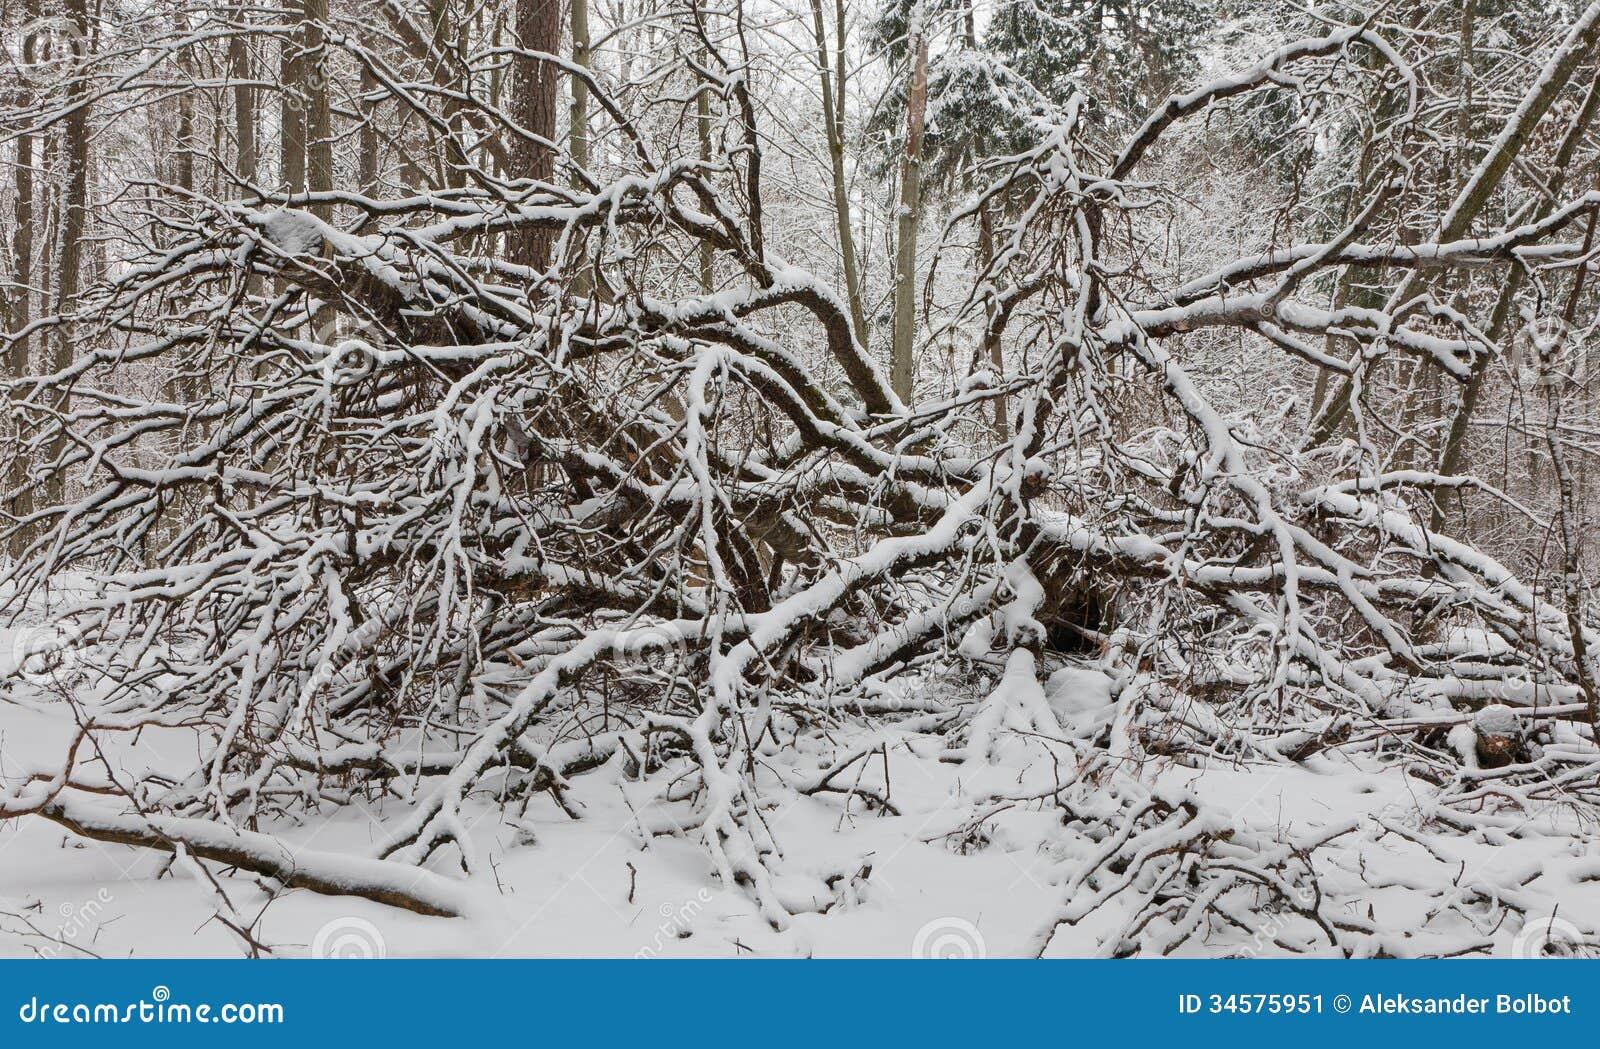 Birch trees in snow at night birch trees stock image